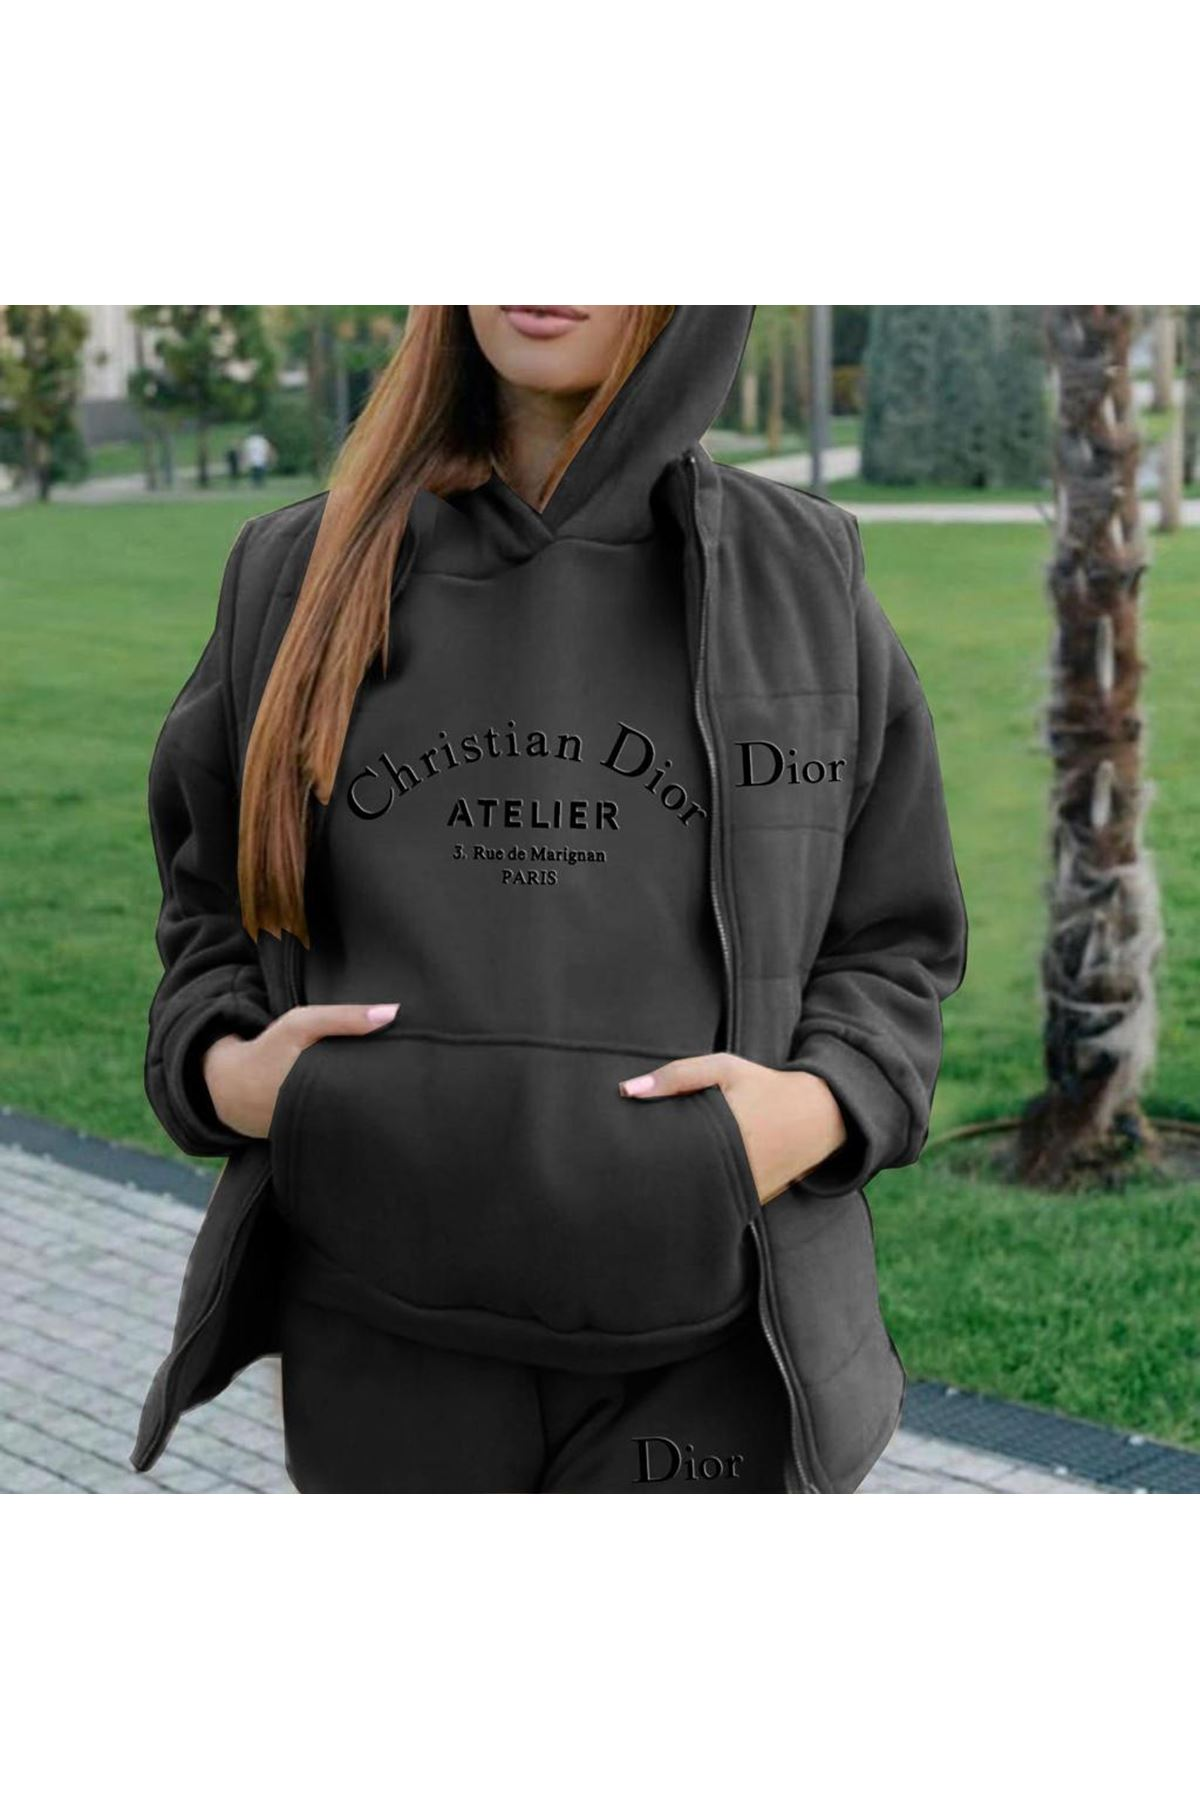 3'lü Dior Takım - siyah